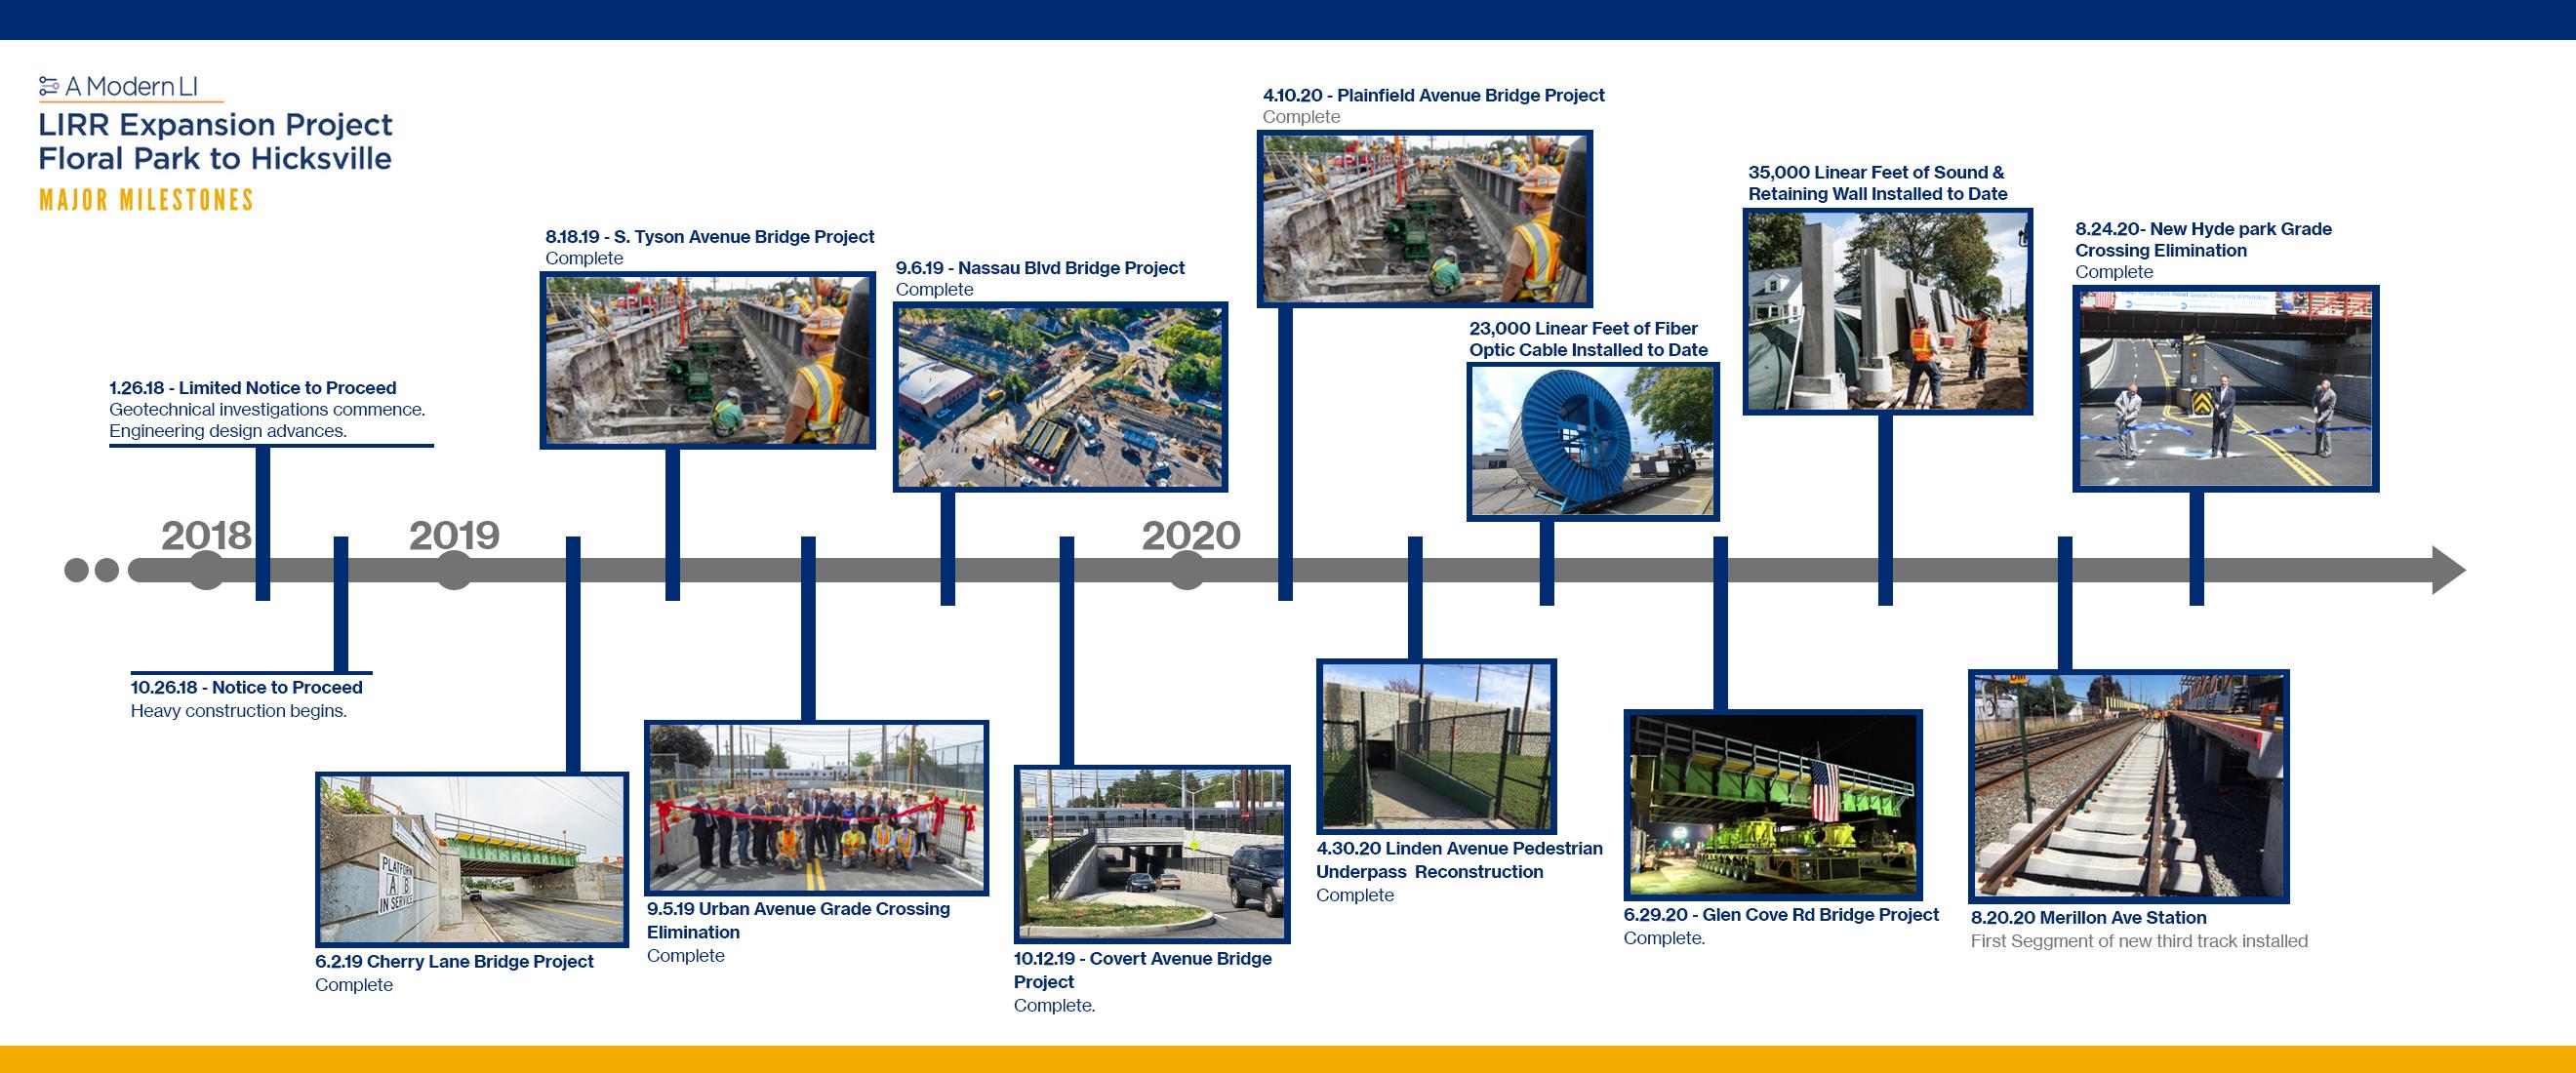 LIRR Expansion Project Major Milestones